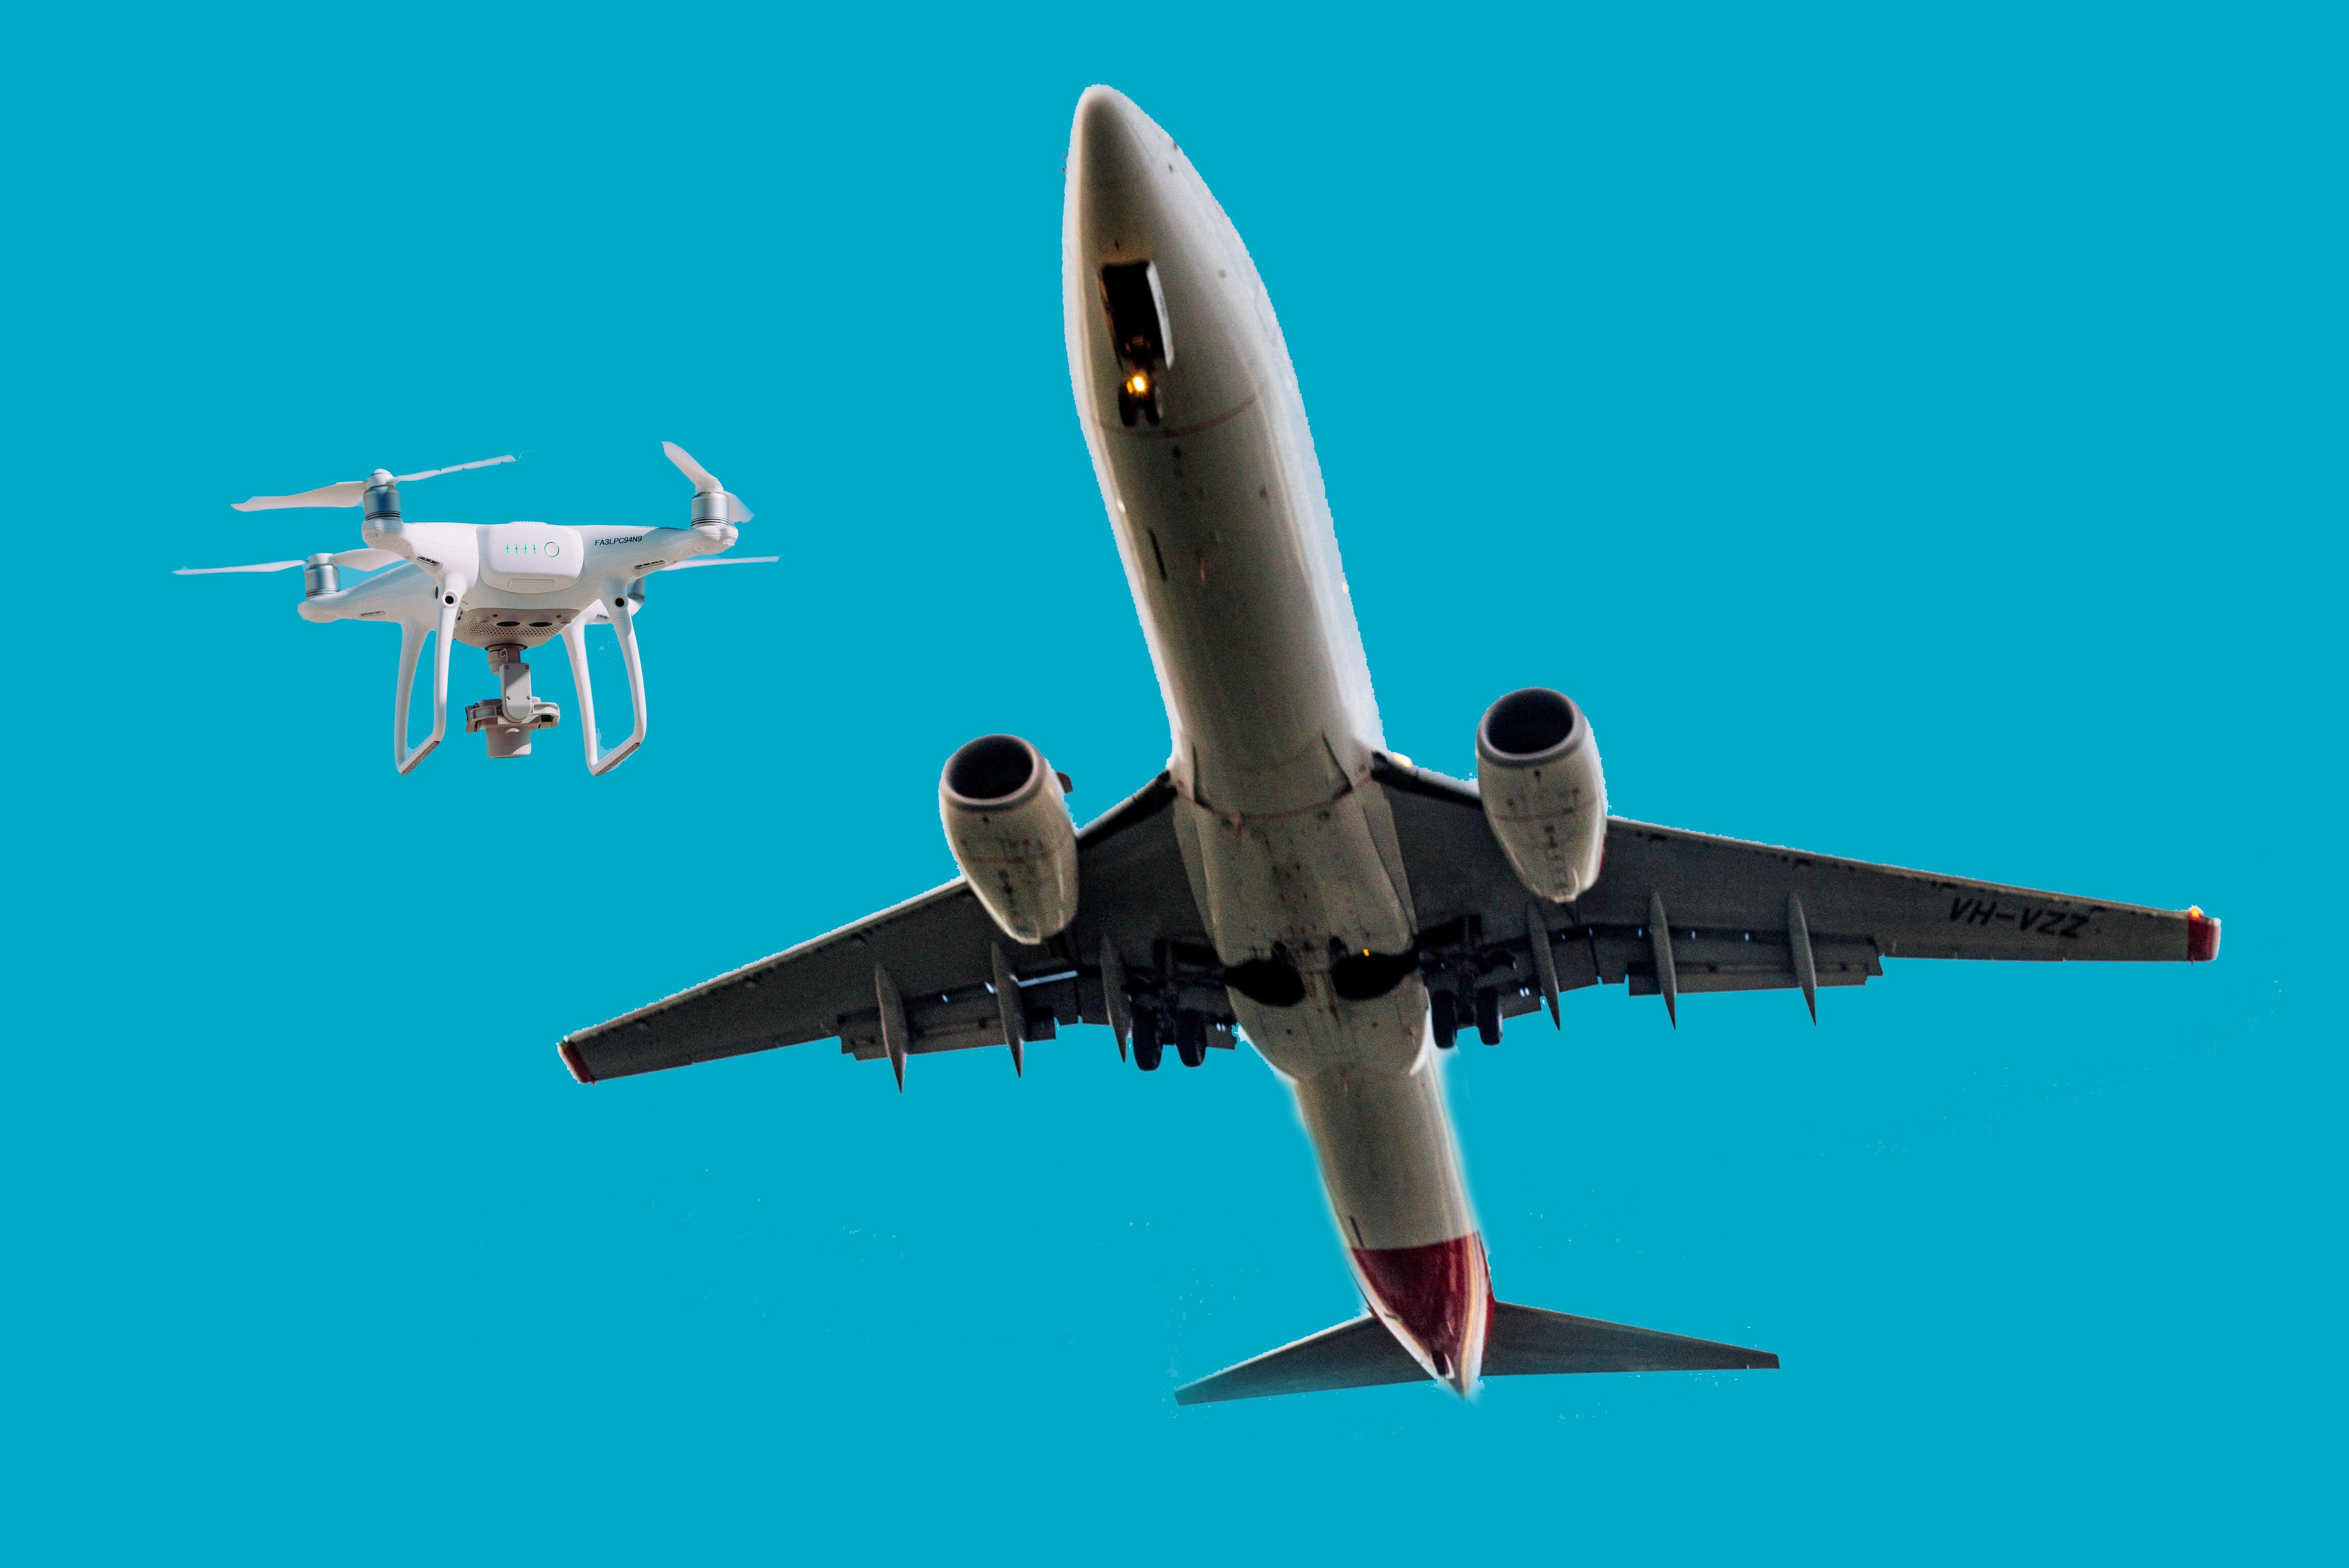 dron-utasszallito-montazs-unsplash.jpg